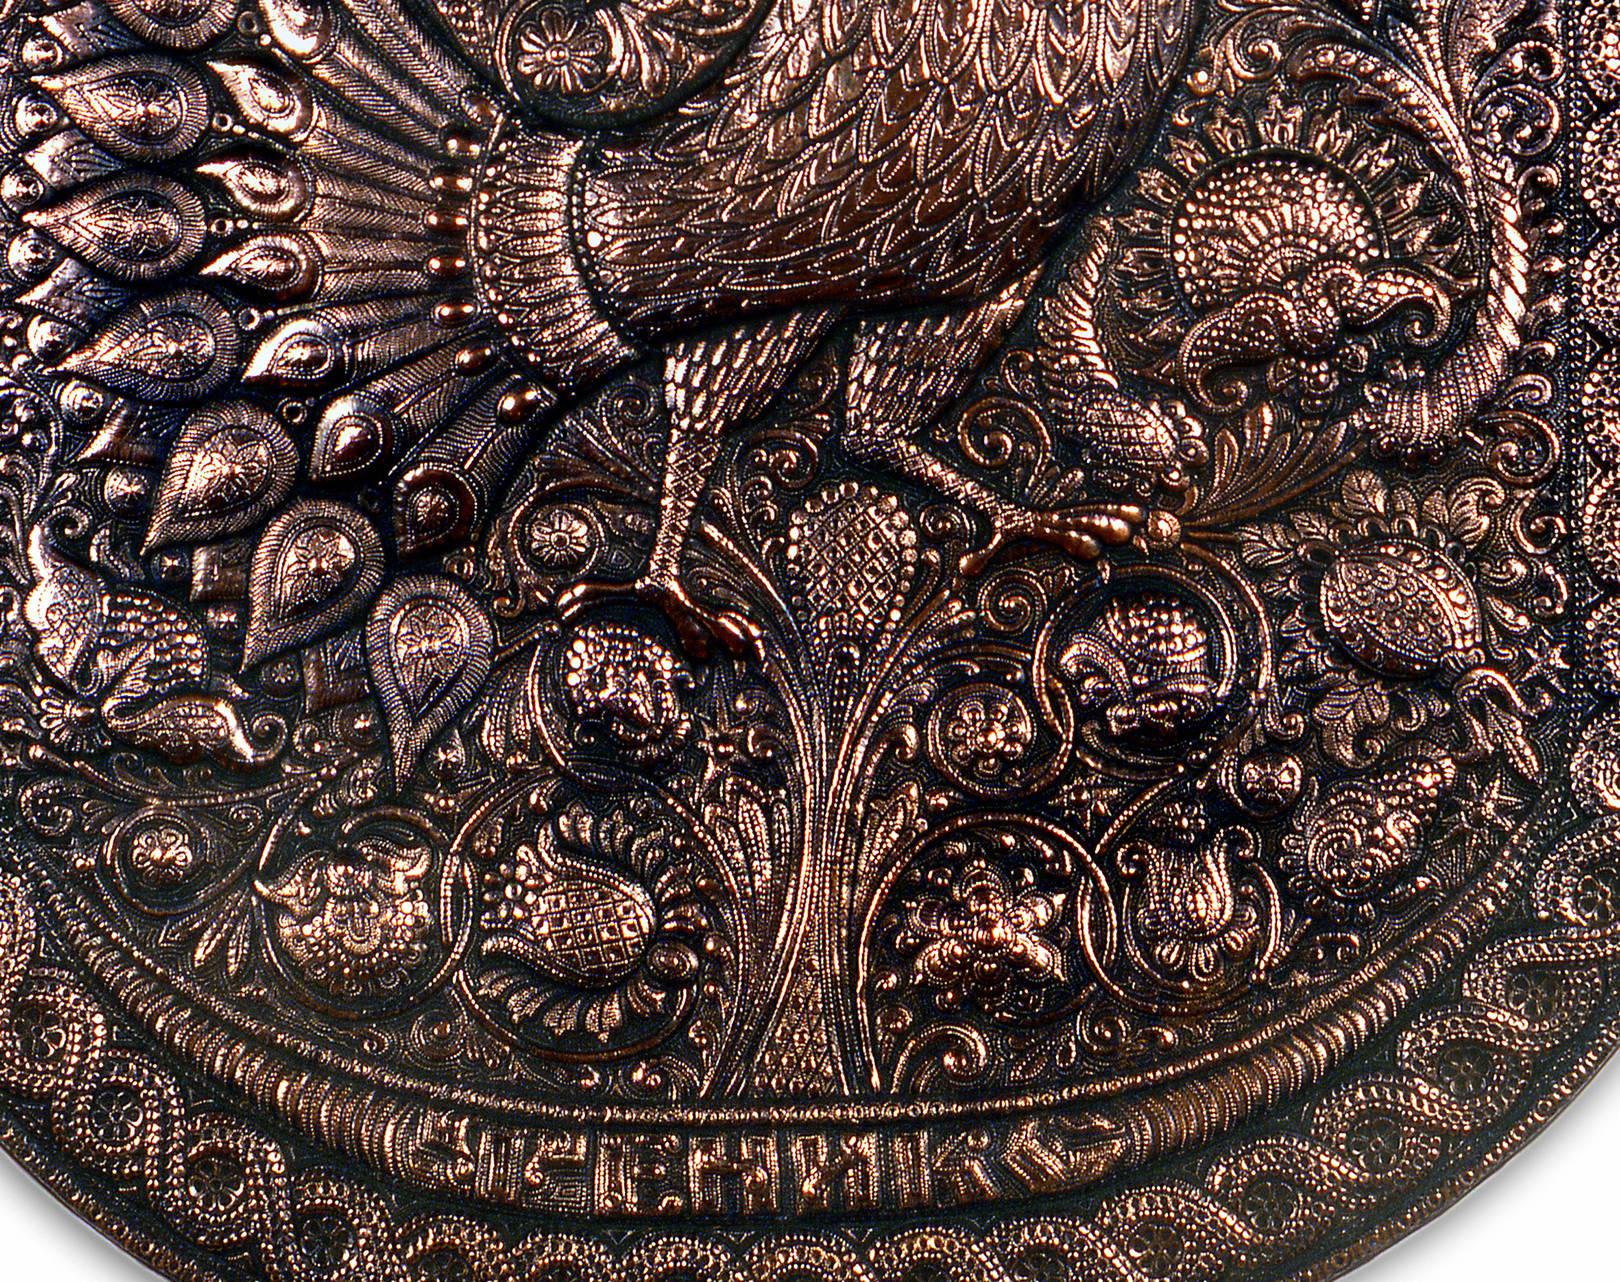 Птица Феникс (фрагмент панно) 1992 г. Медь; чернение 100 х 61 см